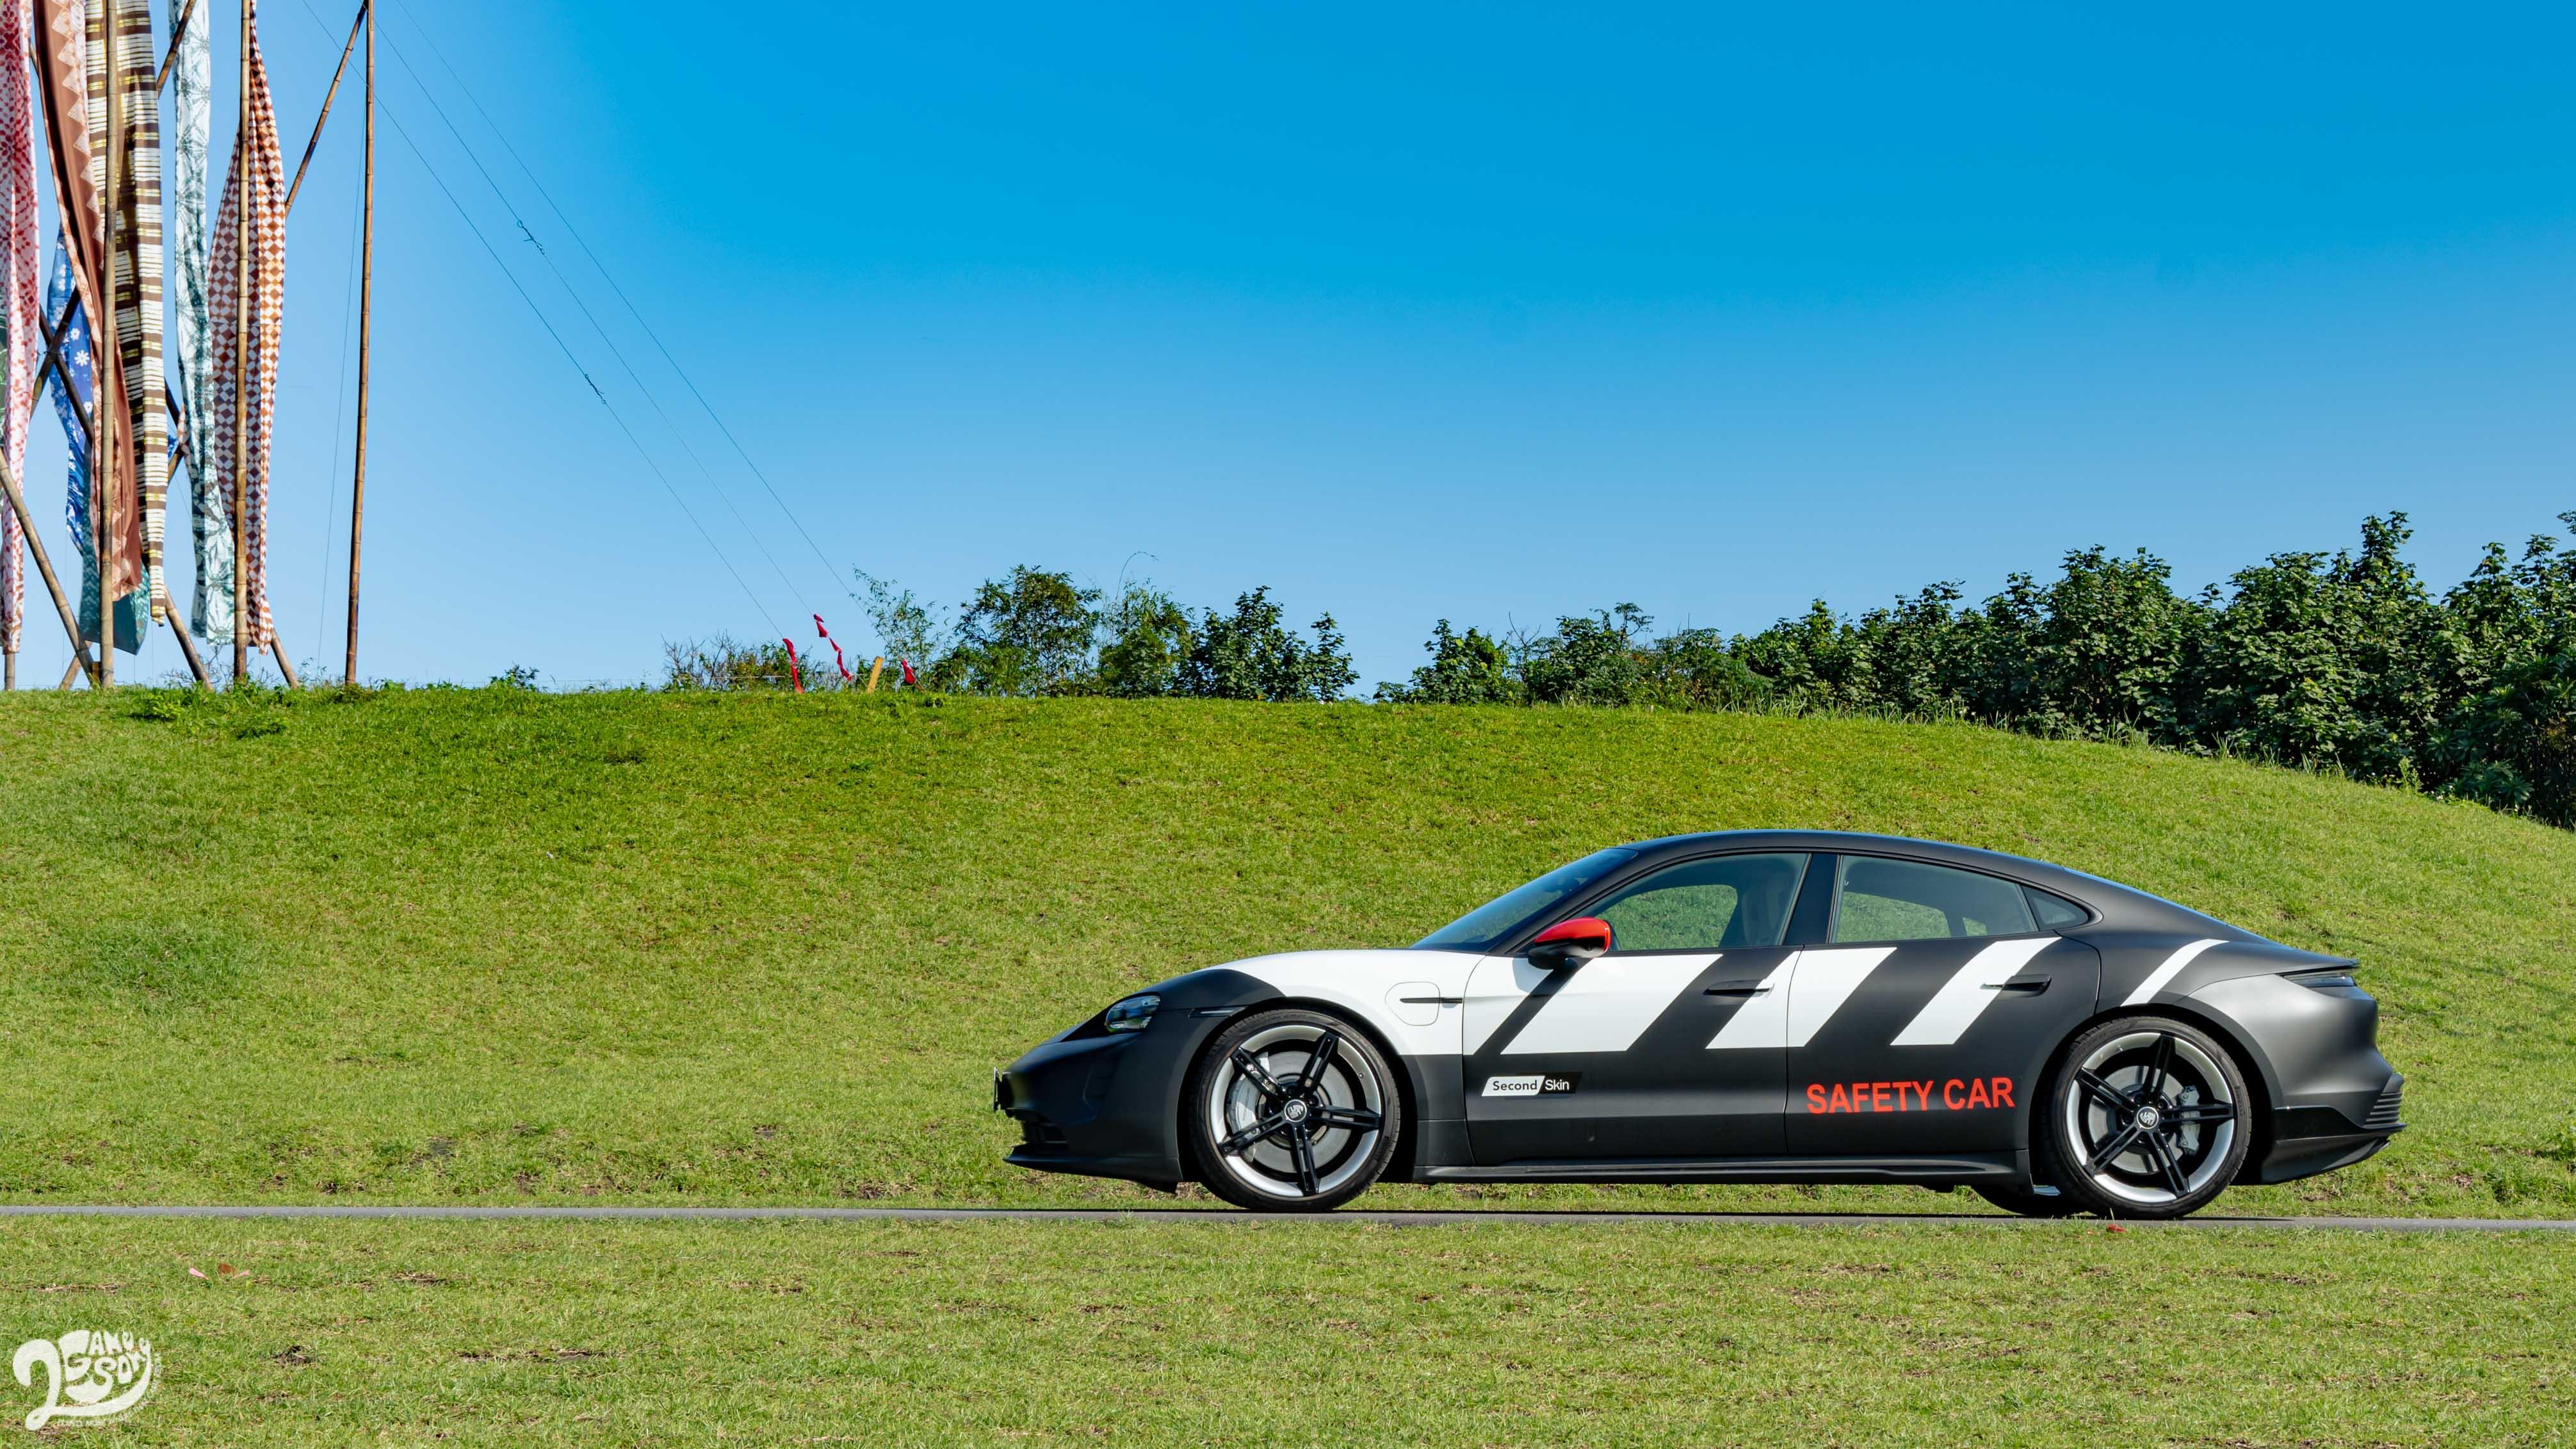 Porsche Taycan 還像不像個保時捷?【專題報導上集】